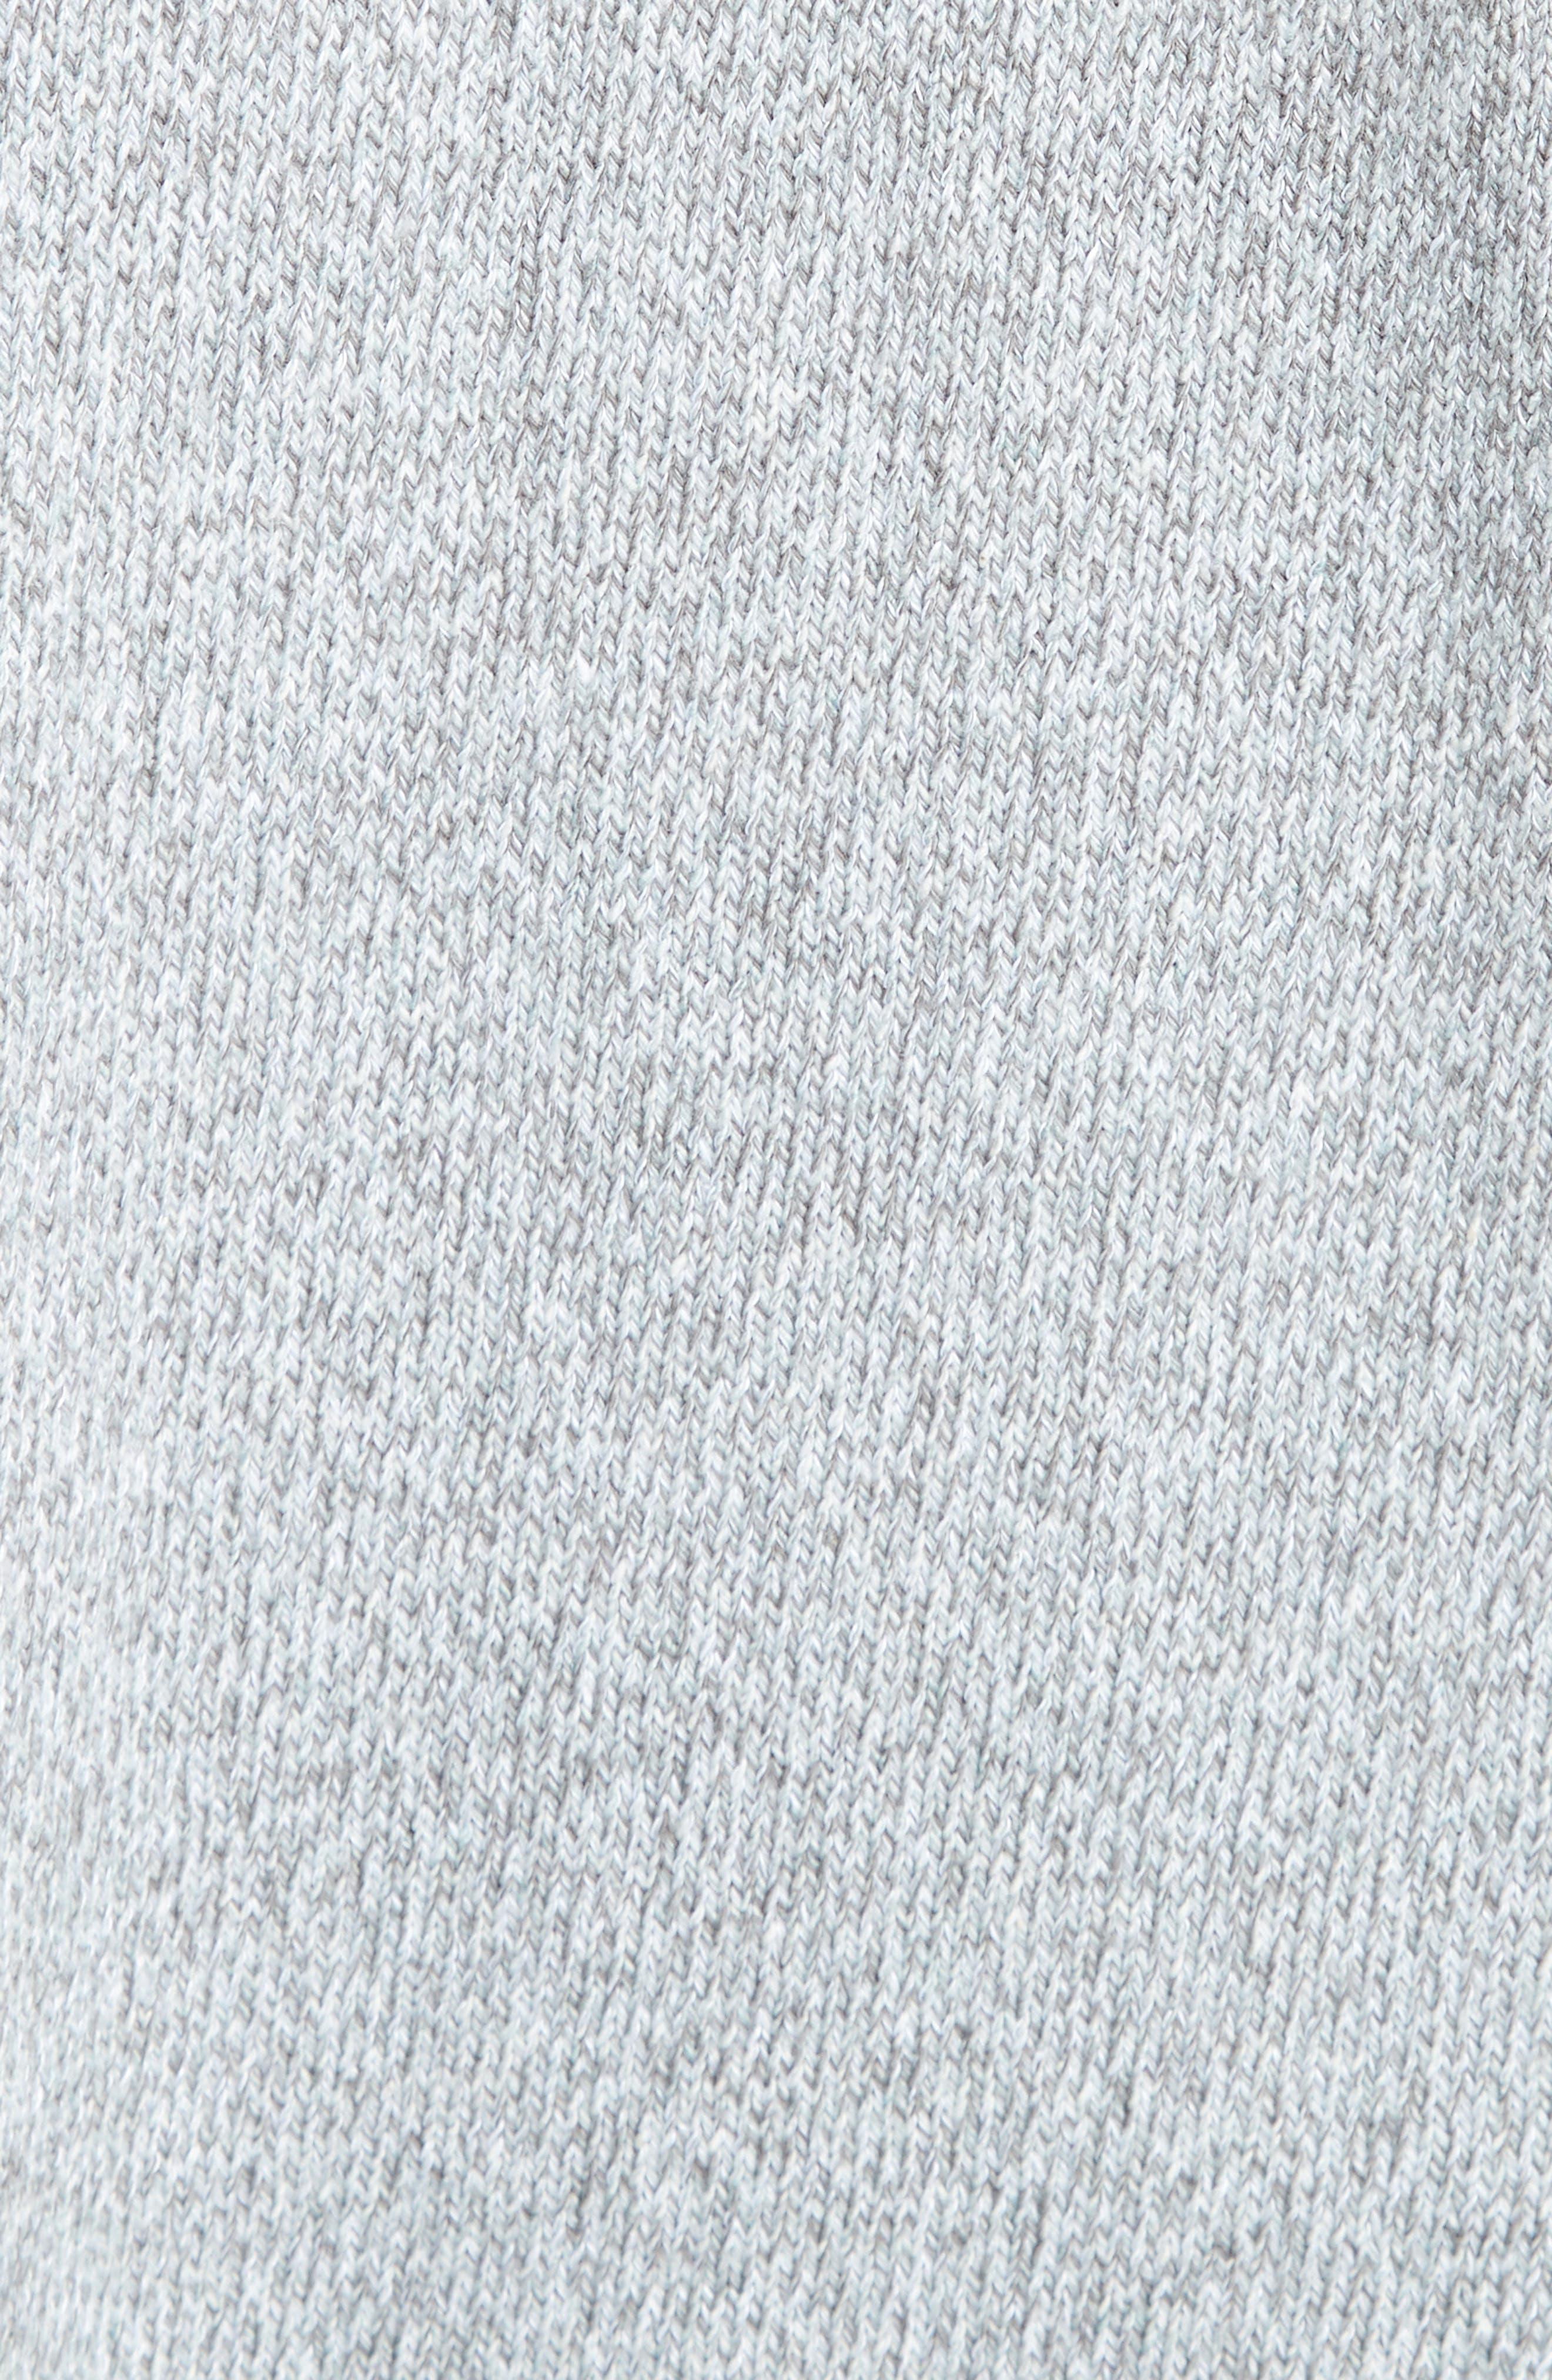 Celia Cowl Neck Sweater,                             Alternate thumbnail 5, color,                             059